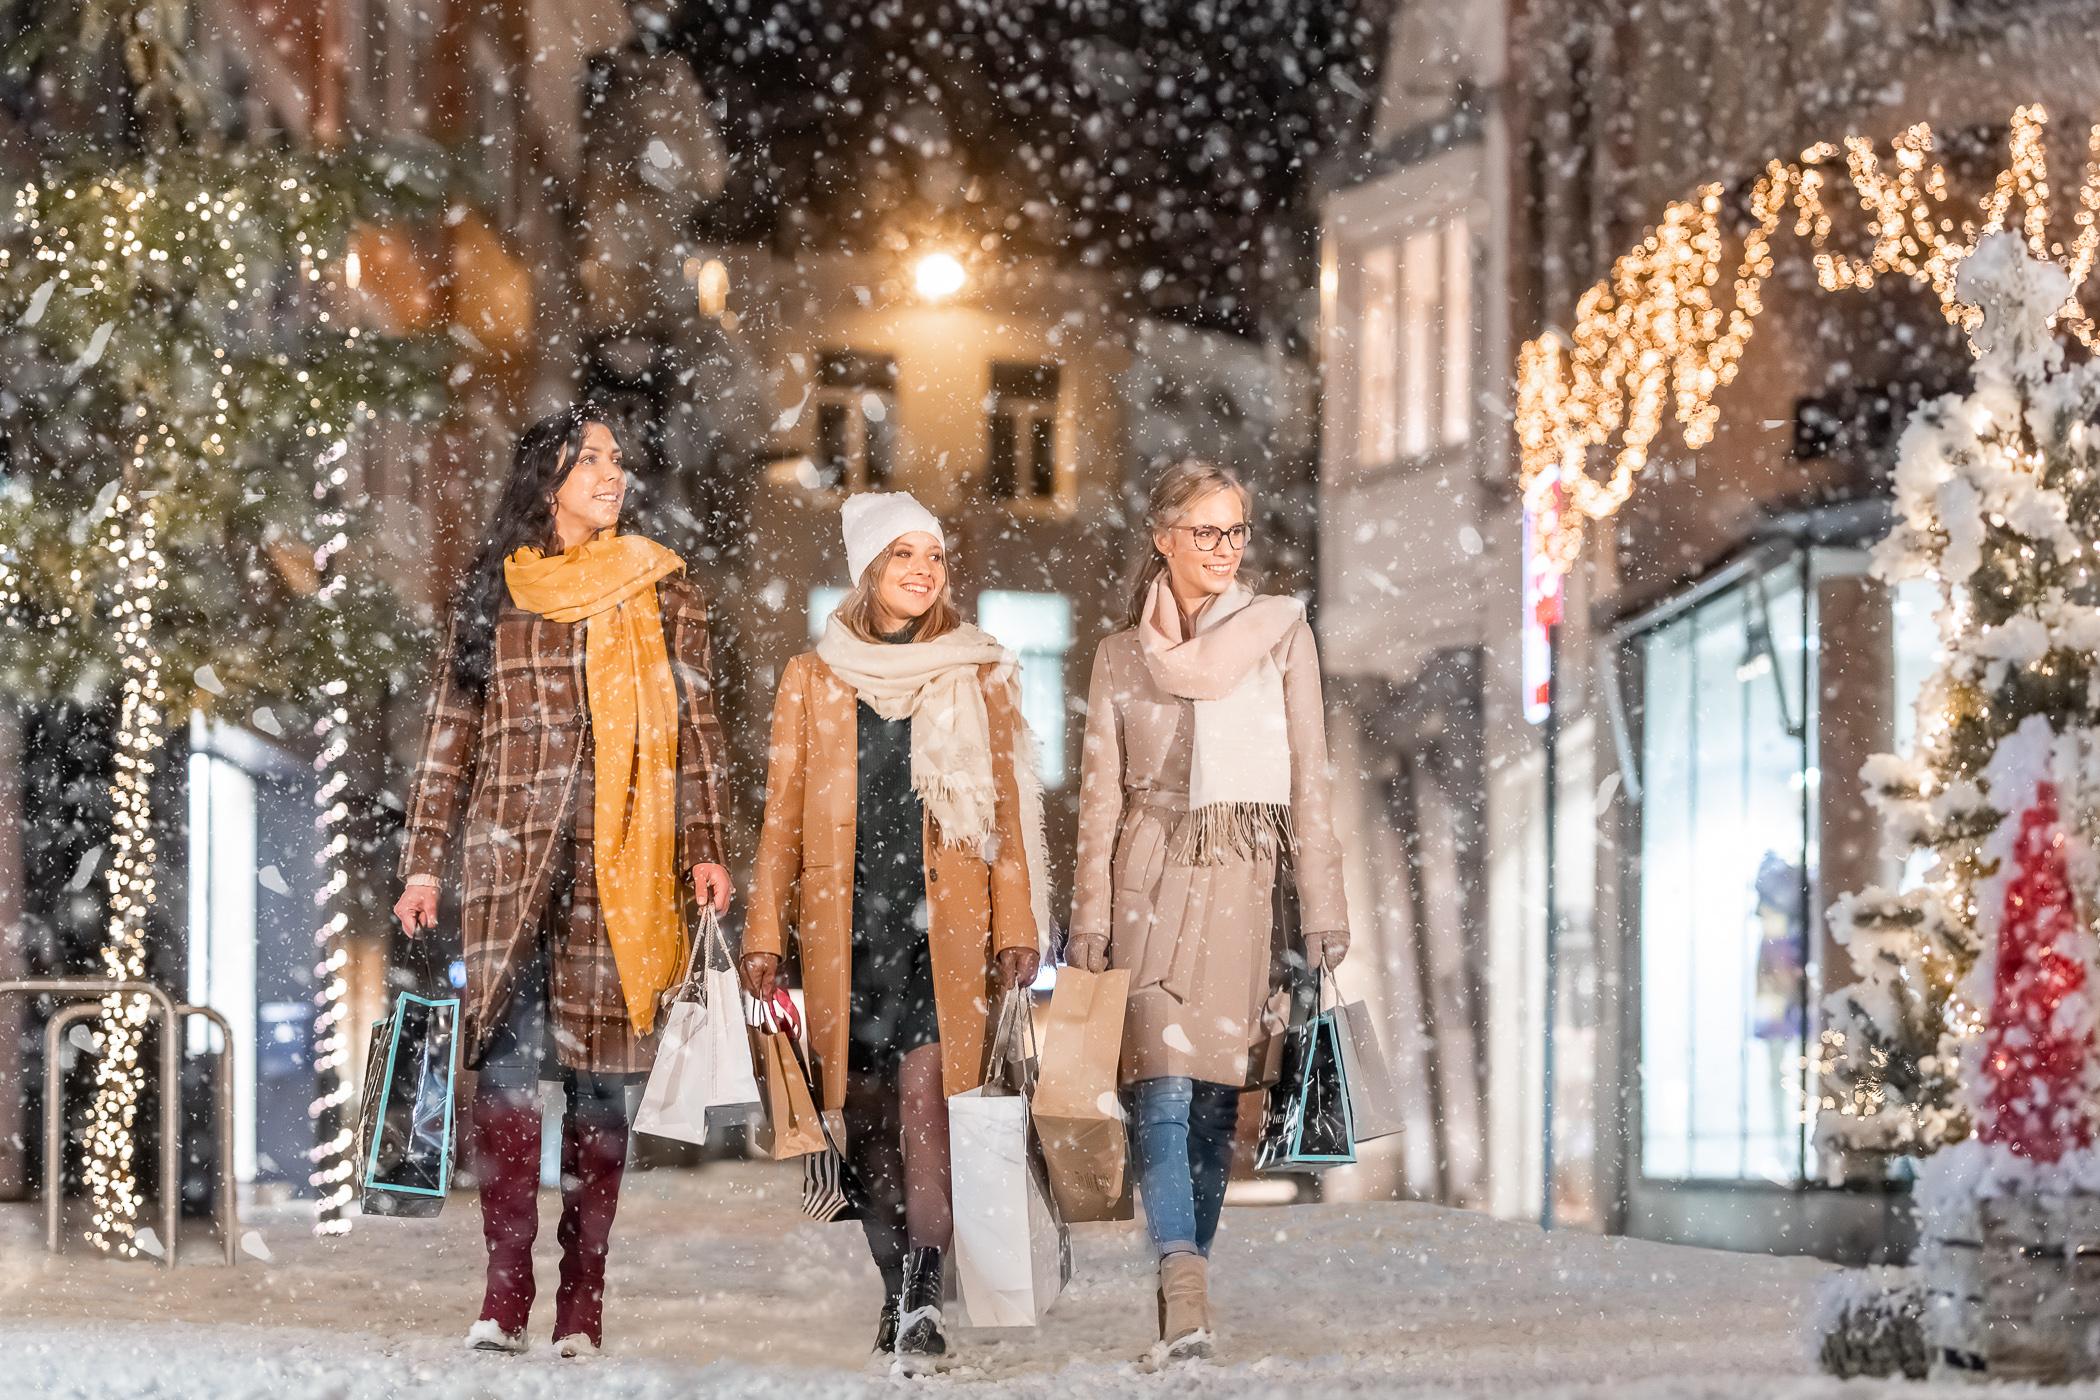 Stad Hasselt - Winter shoppen